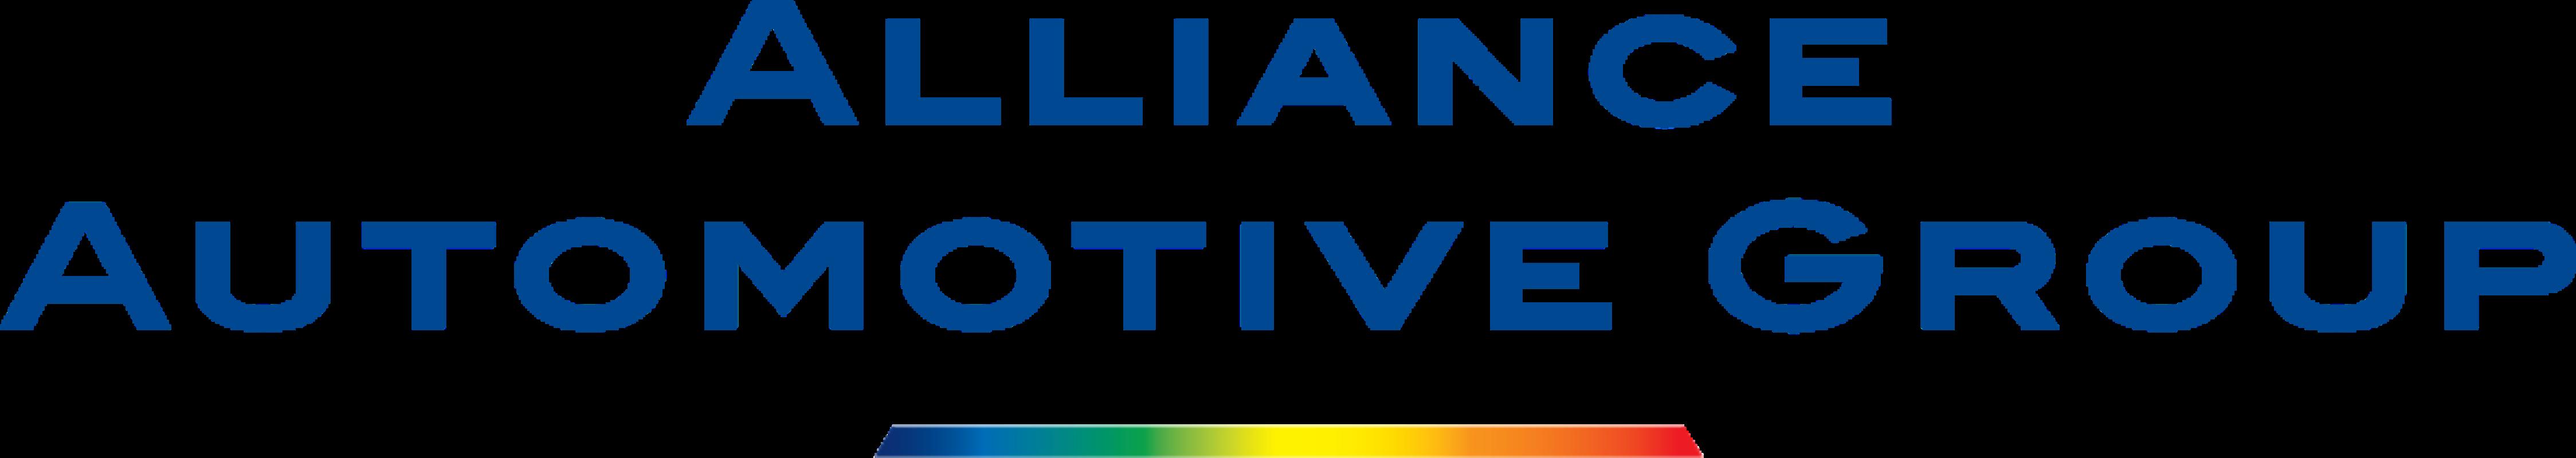 Alliance Automotive Group Benelux B.V. (PartsPoint Group) logo